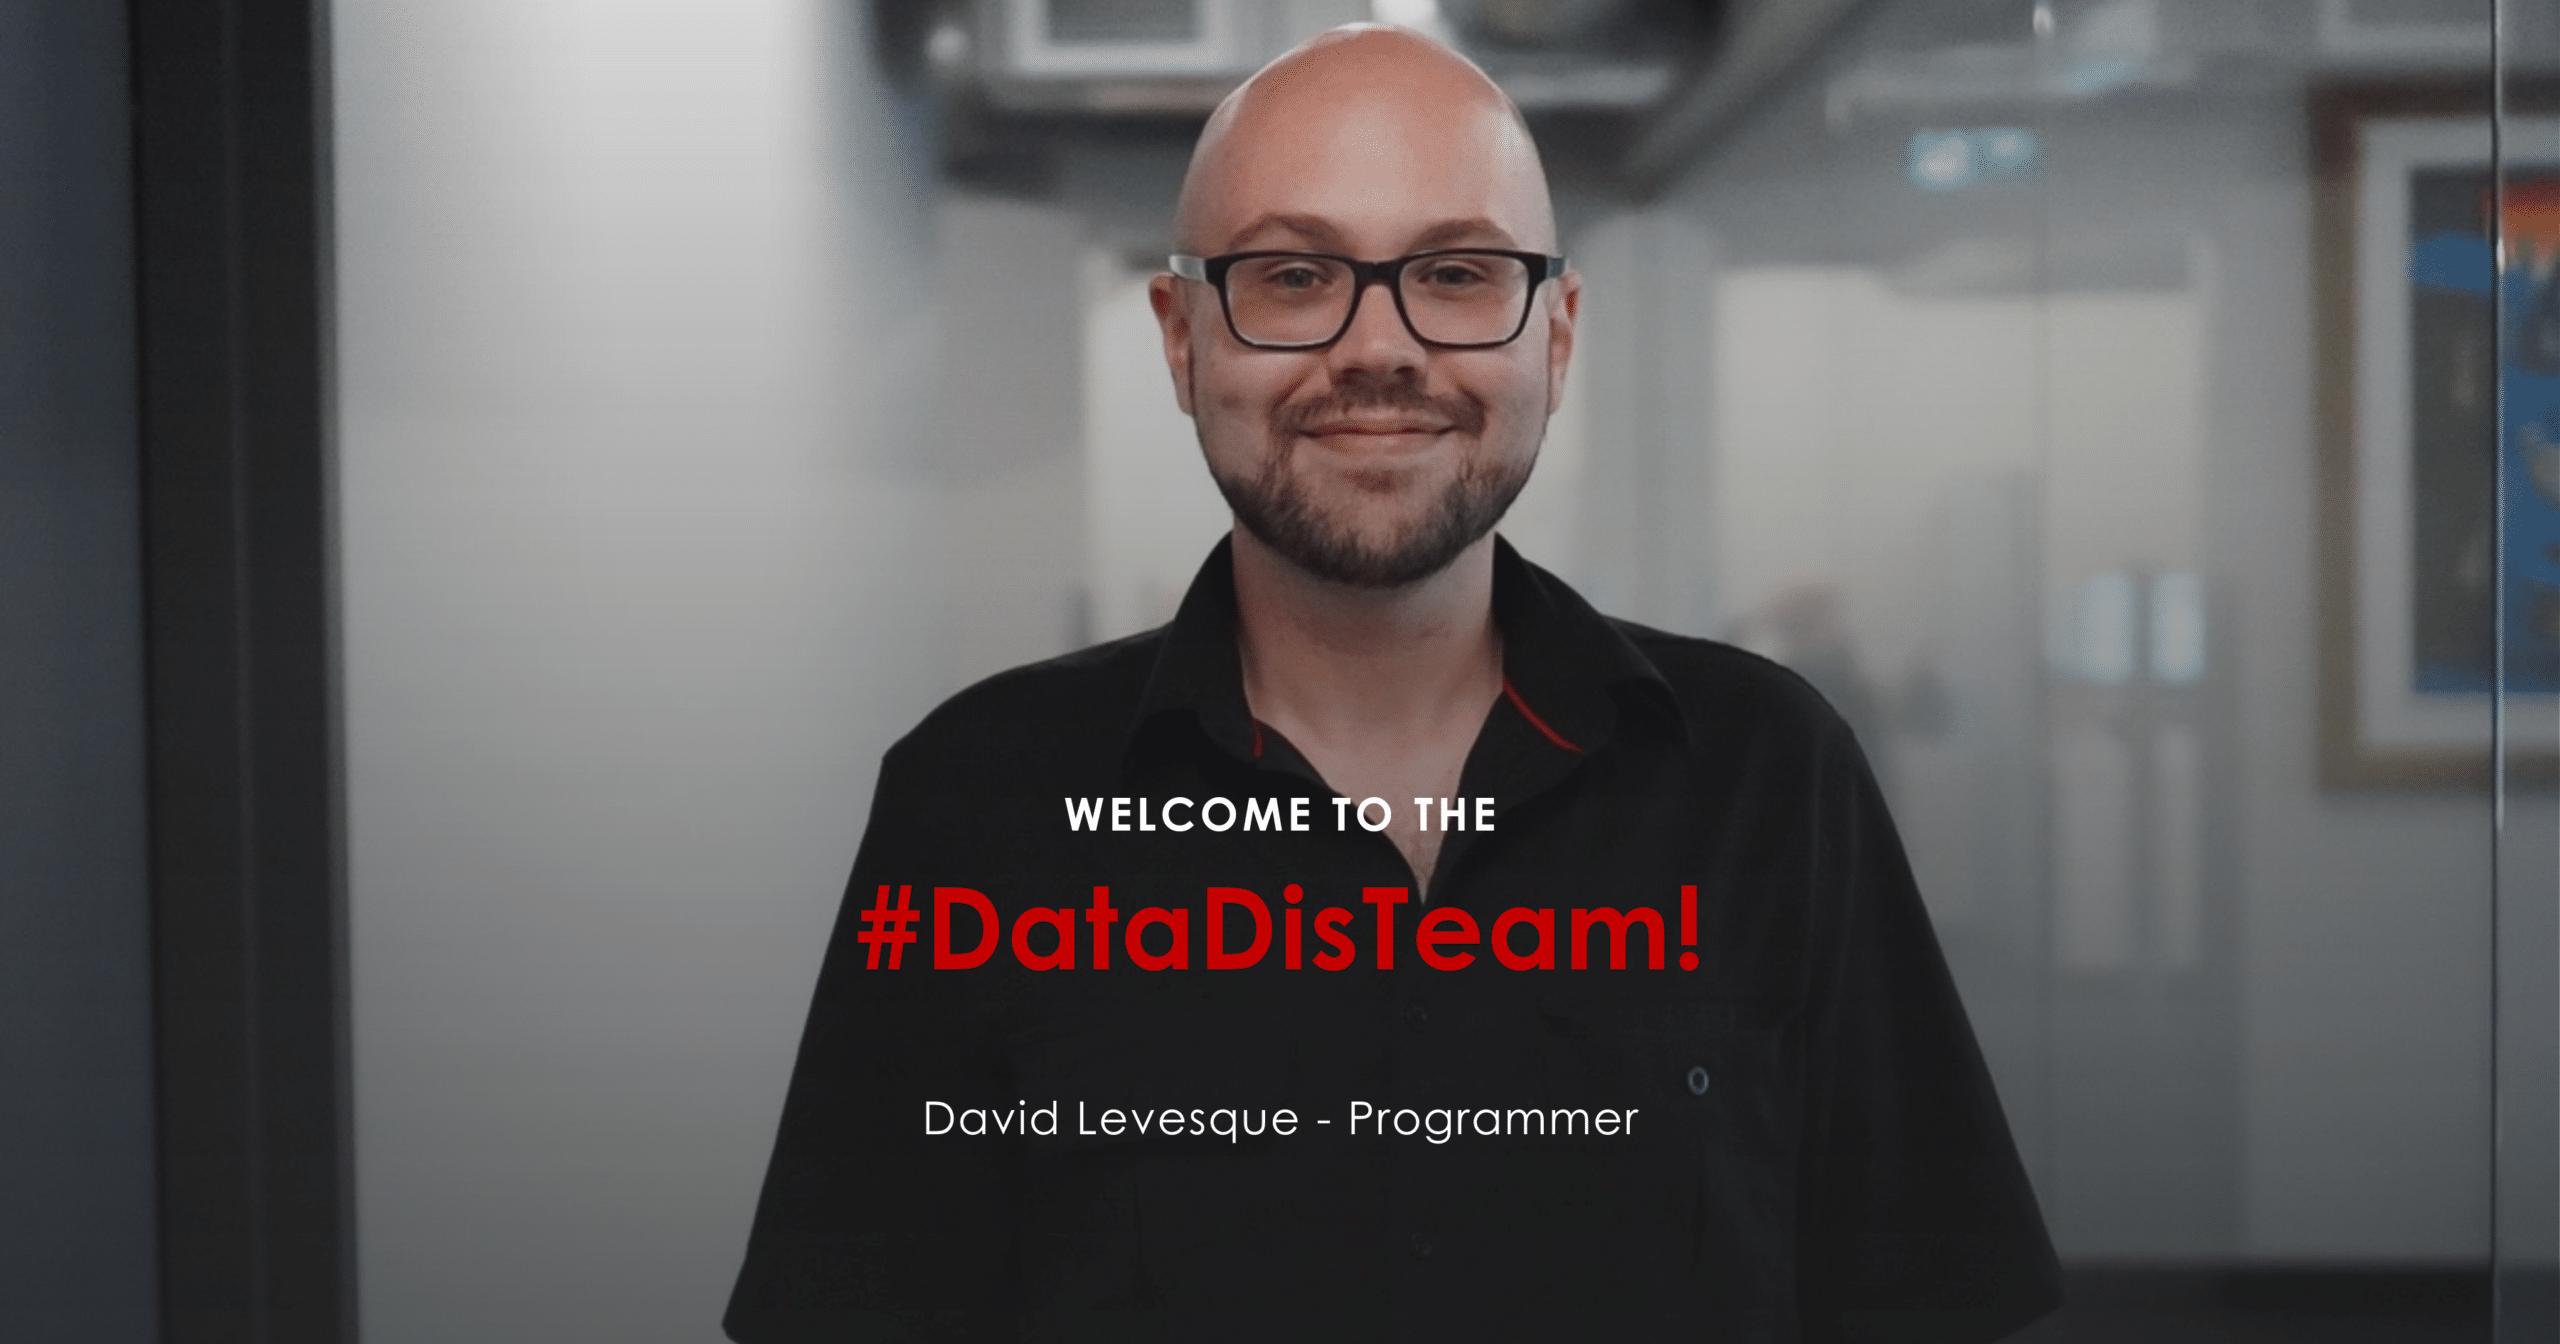 David Levesque New Programmer at DataDis